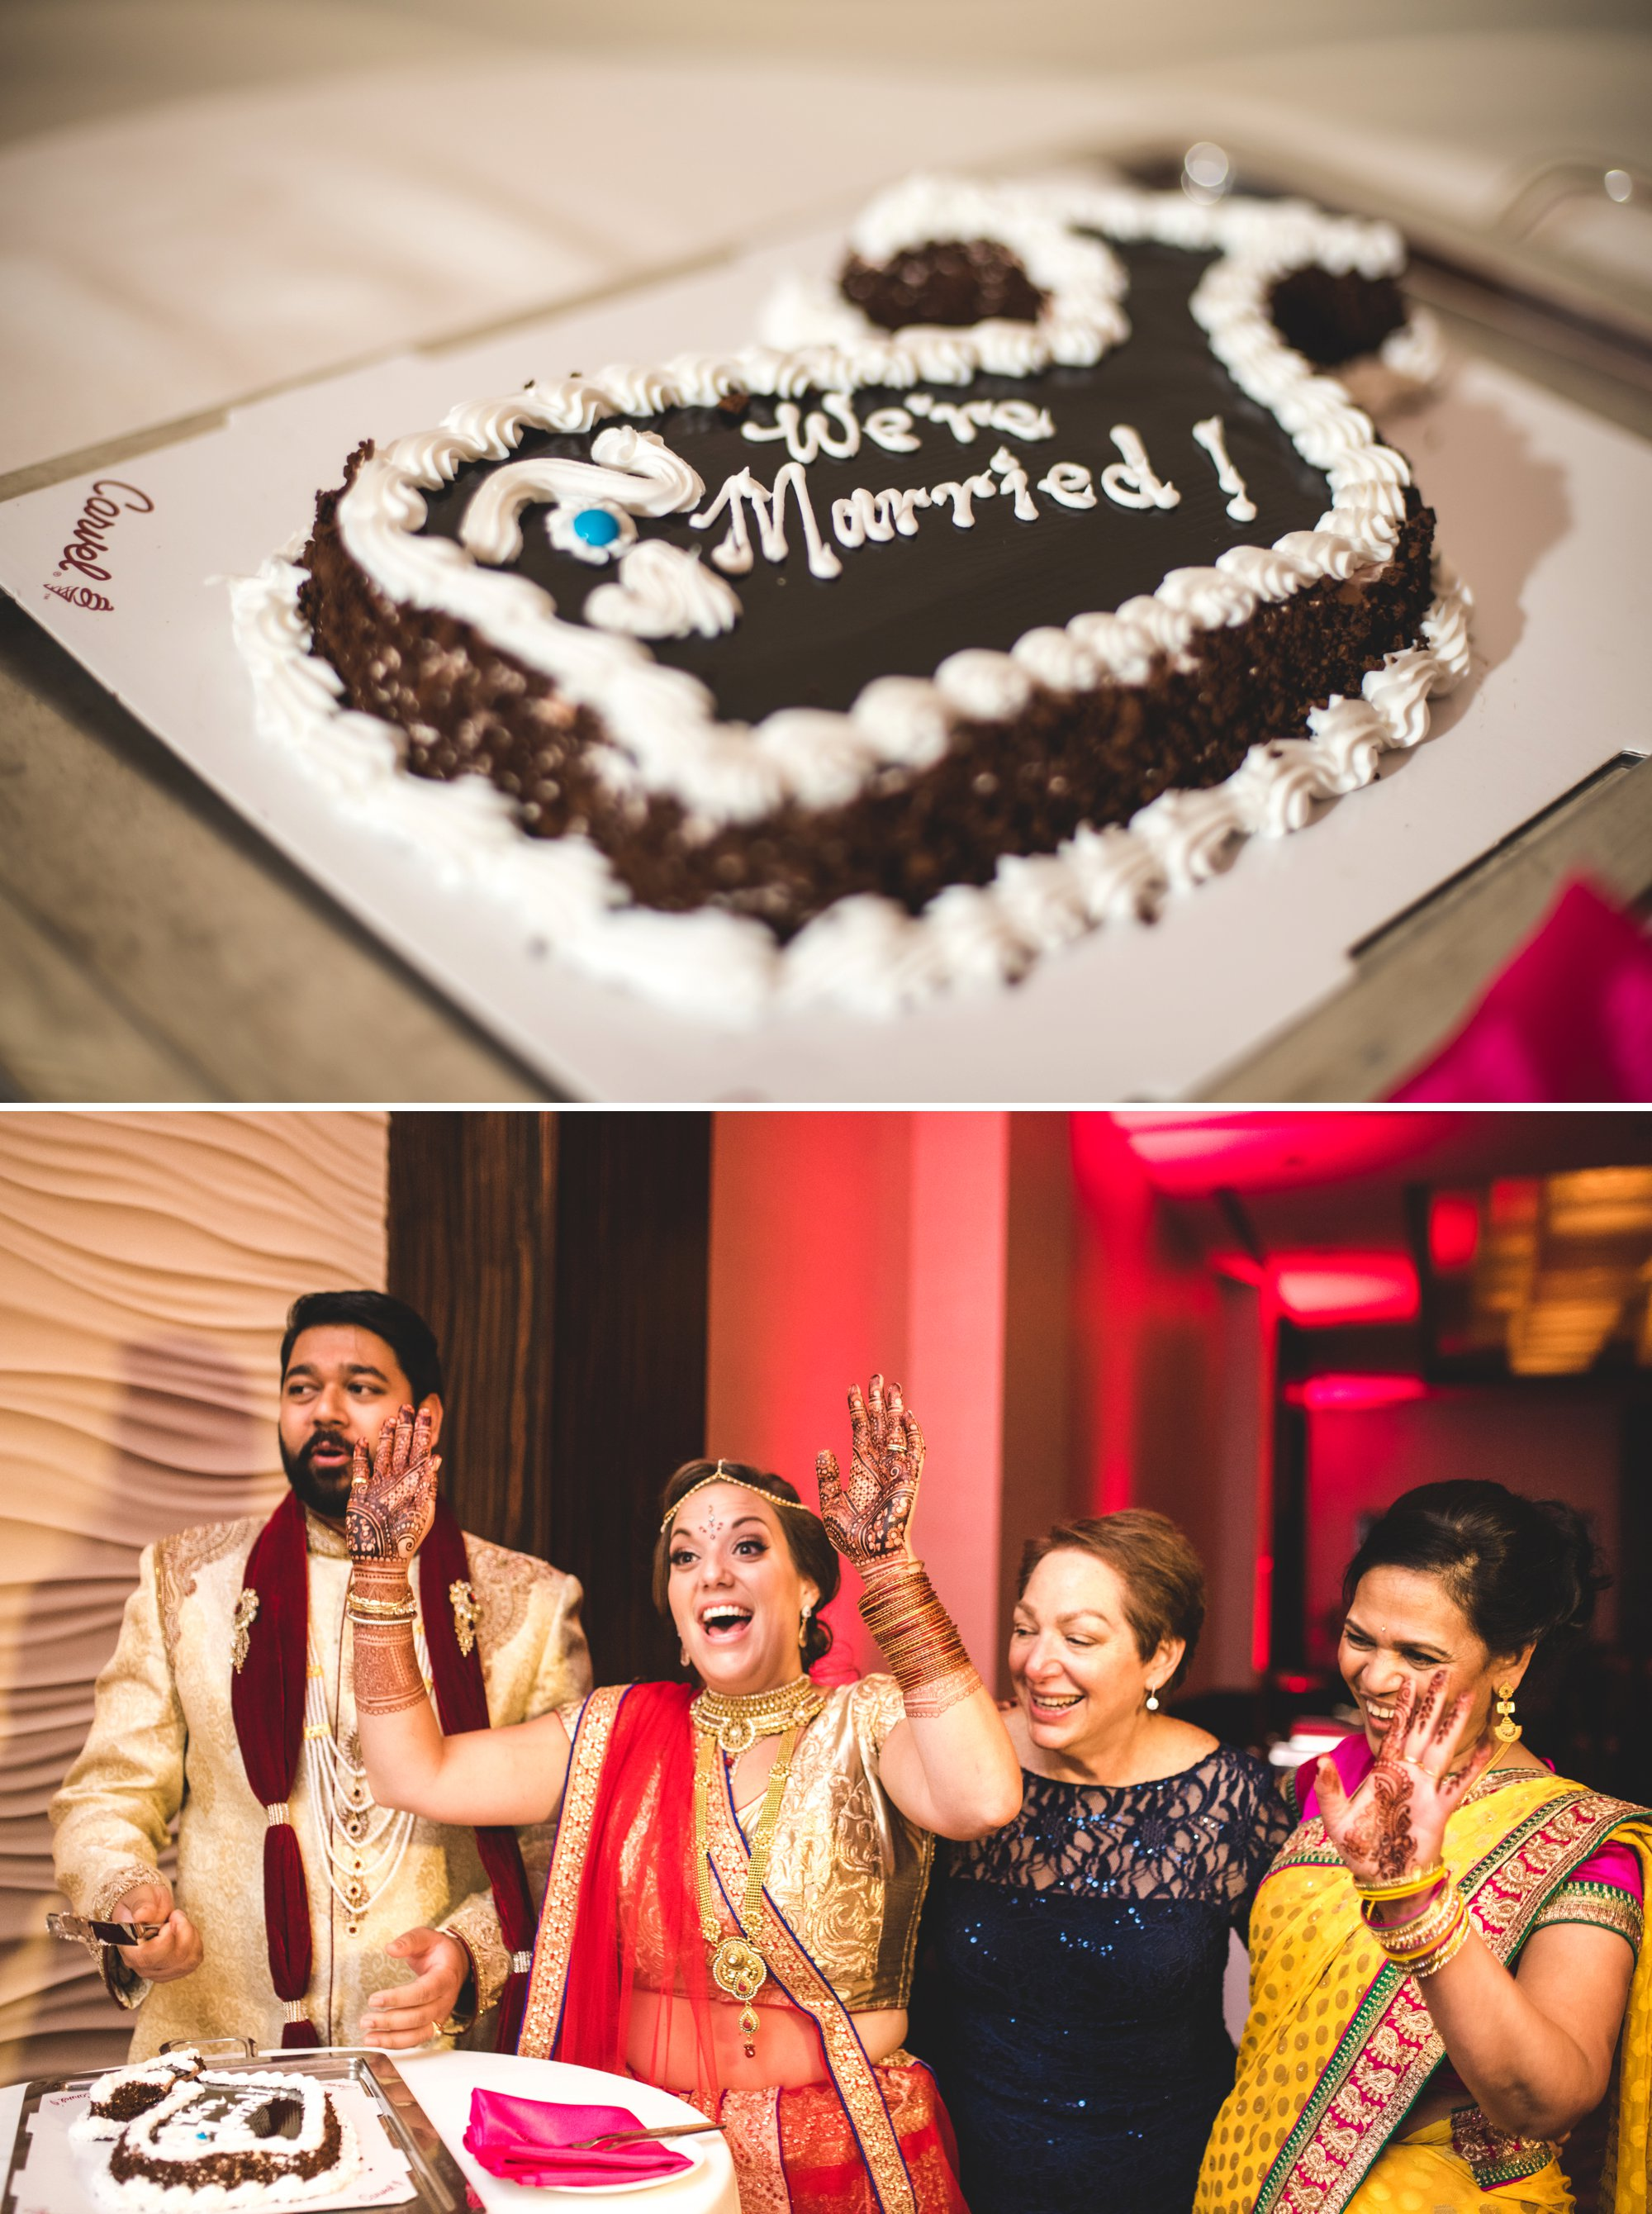 Washington DC colorful Indian wedding with a feminist bride. Cake cutting